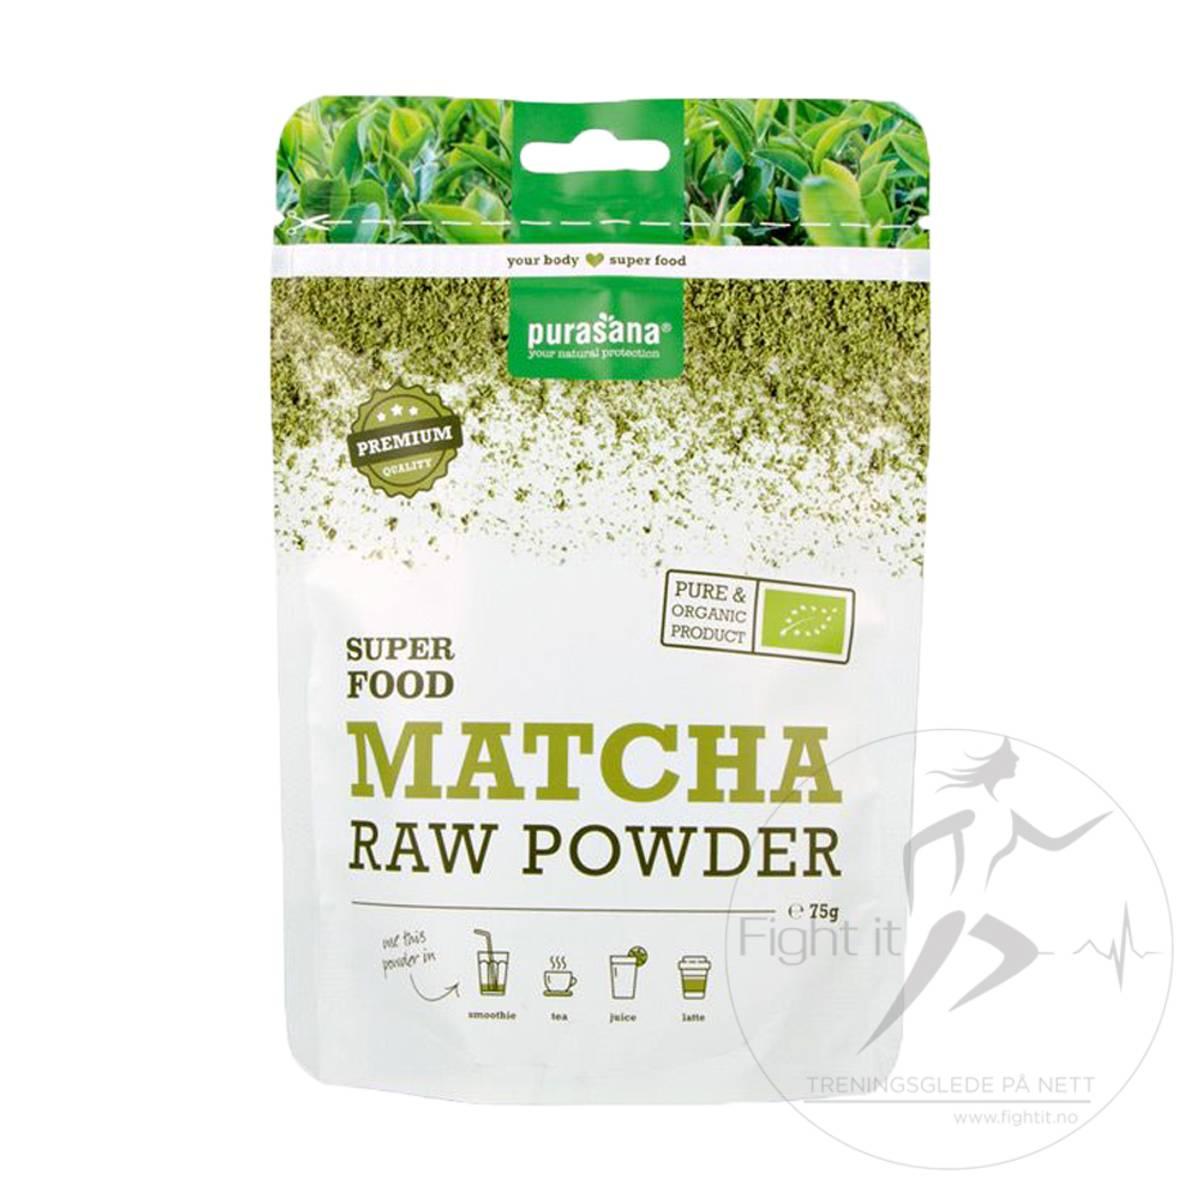 Purasana - Matcha RAW Powder 75g